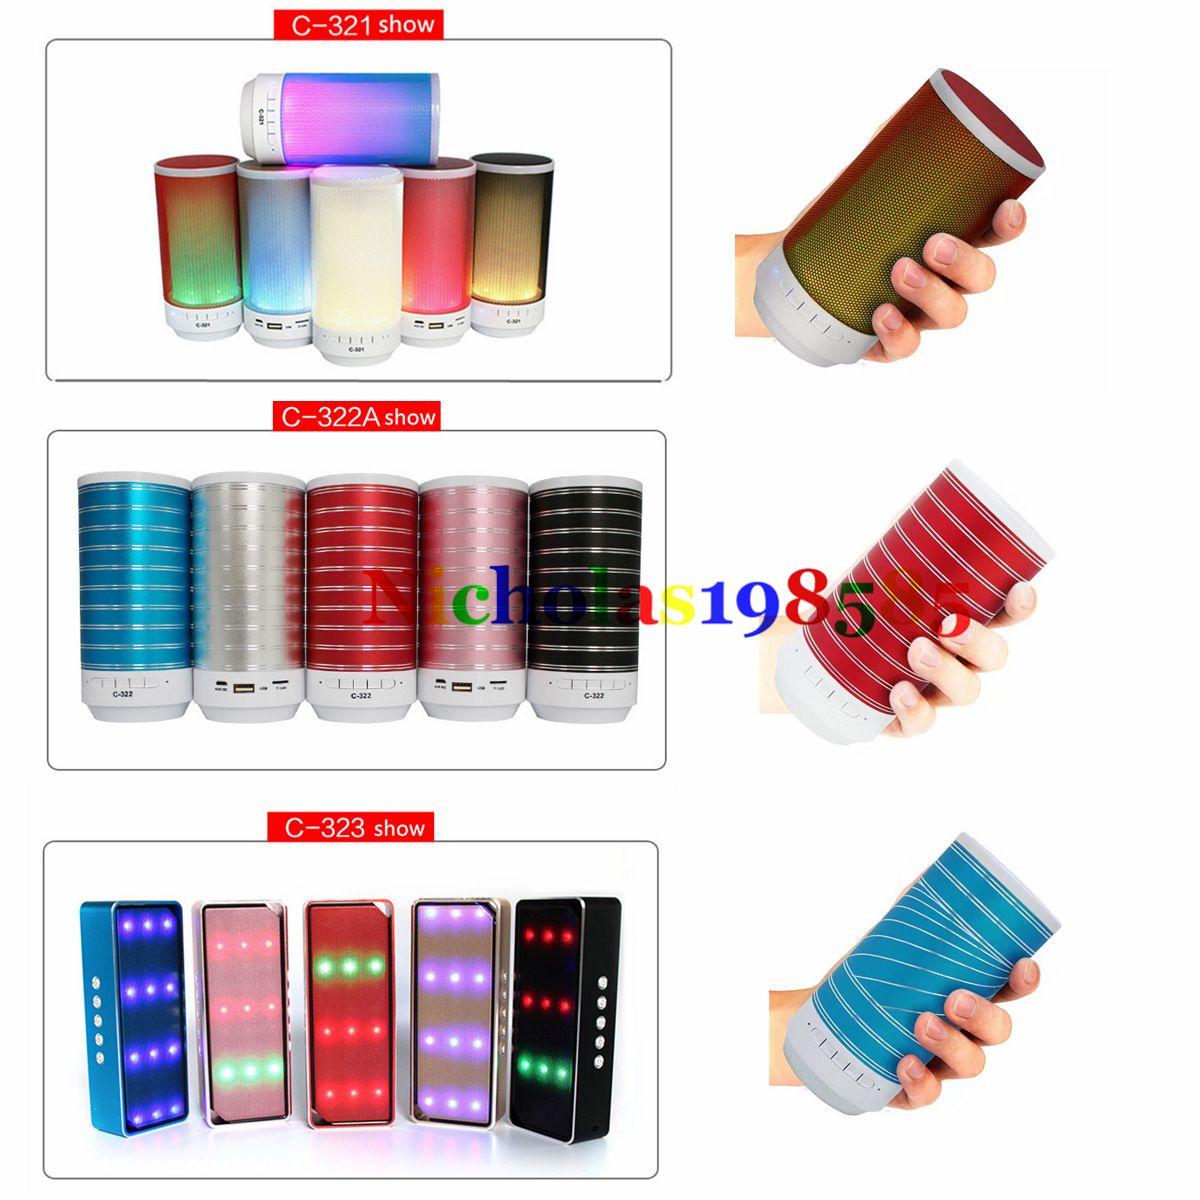 2018 Mini Protable Bluetooth Wireless Speaker C 321 322a 322b Musik Box 323 Handsfree Mic Super Bass Tf Card U Disk Mp3 Music Player Led Light Flash From